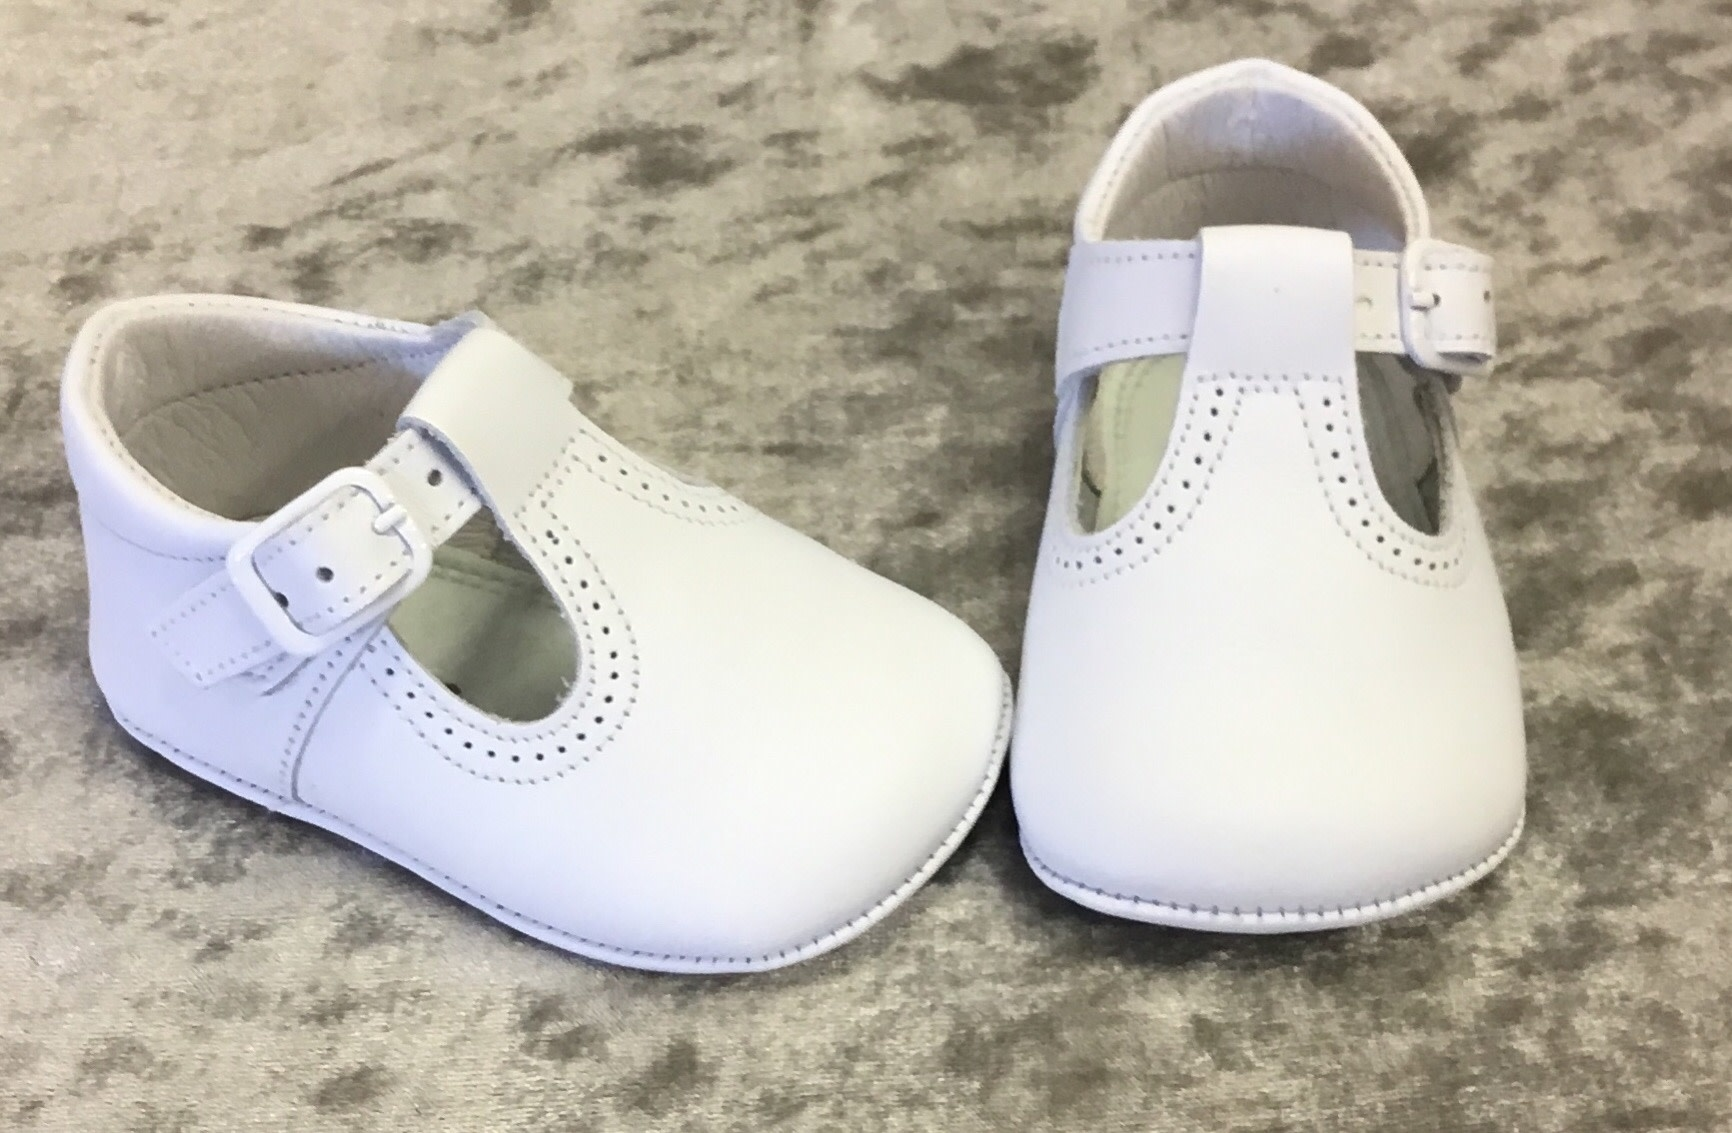 leon Leon T bar 3073  White Leather Pram Shoe